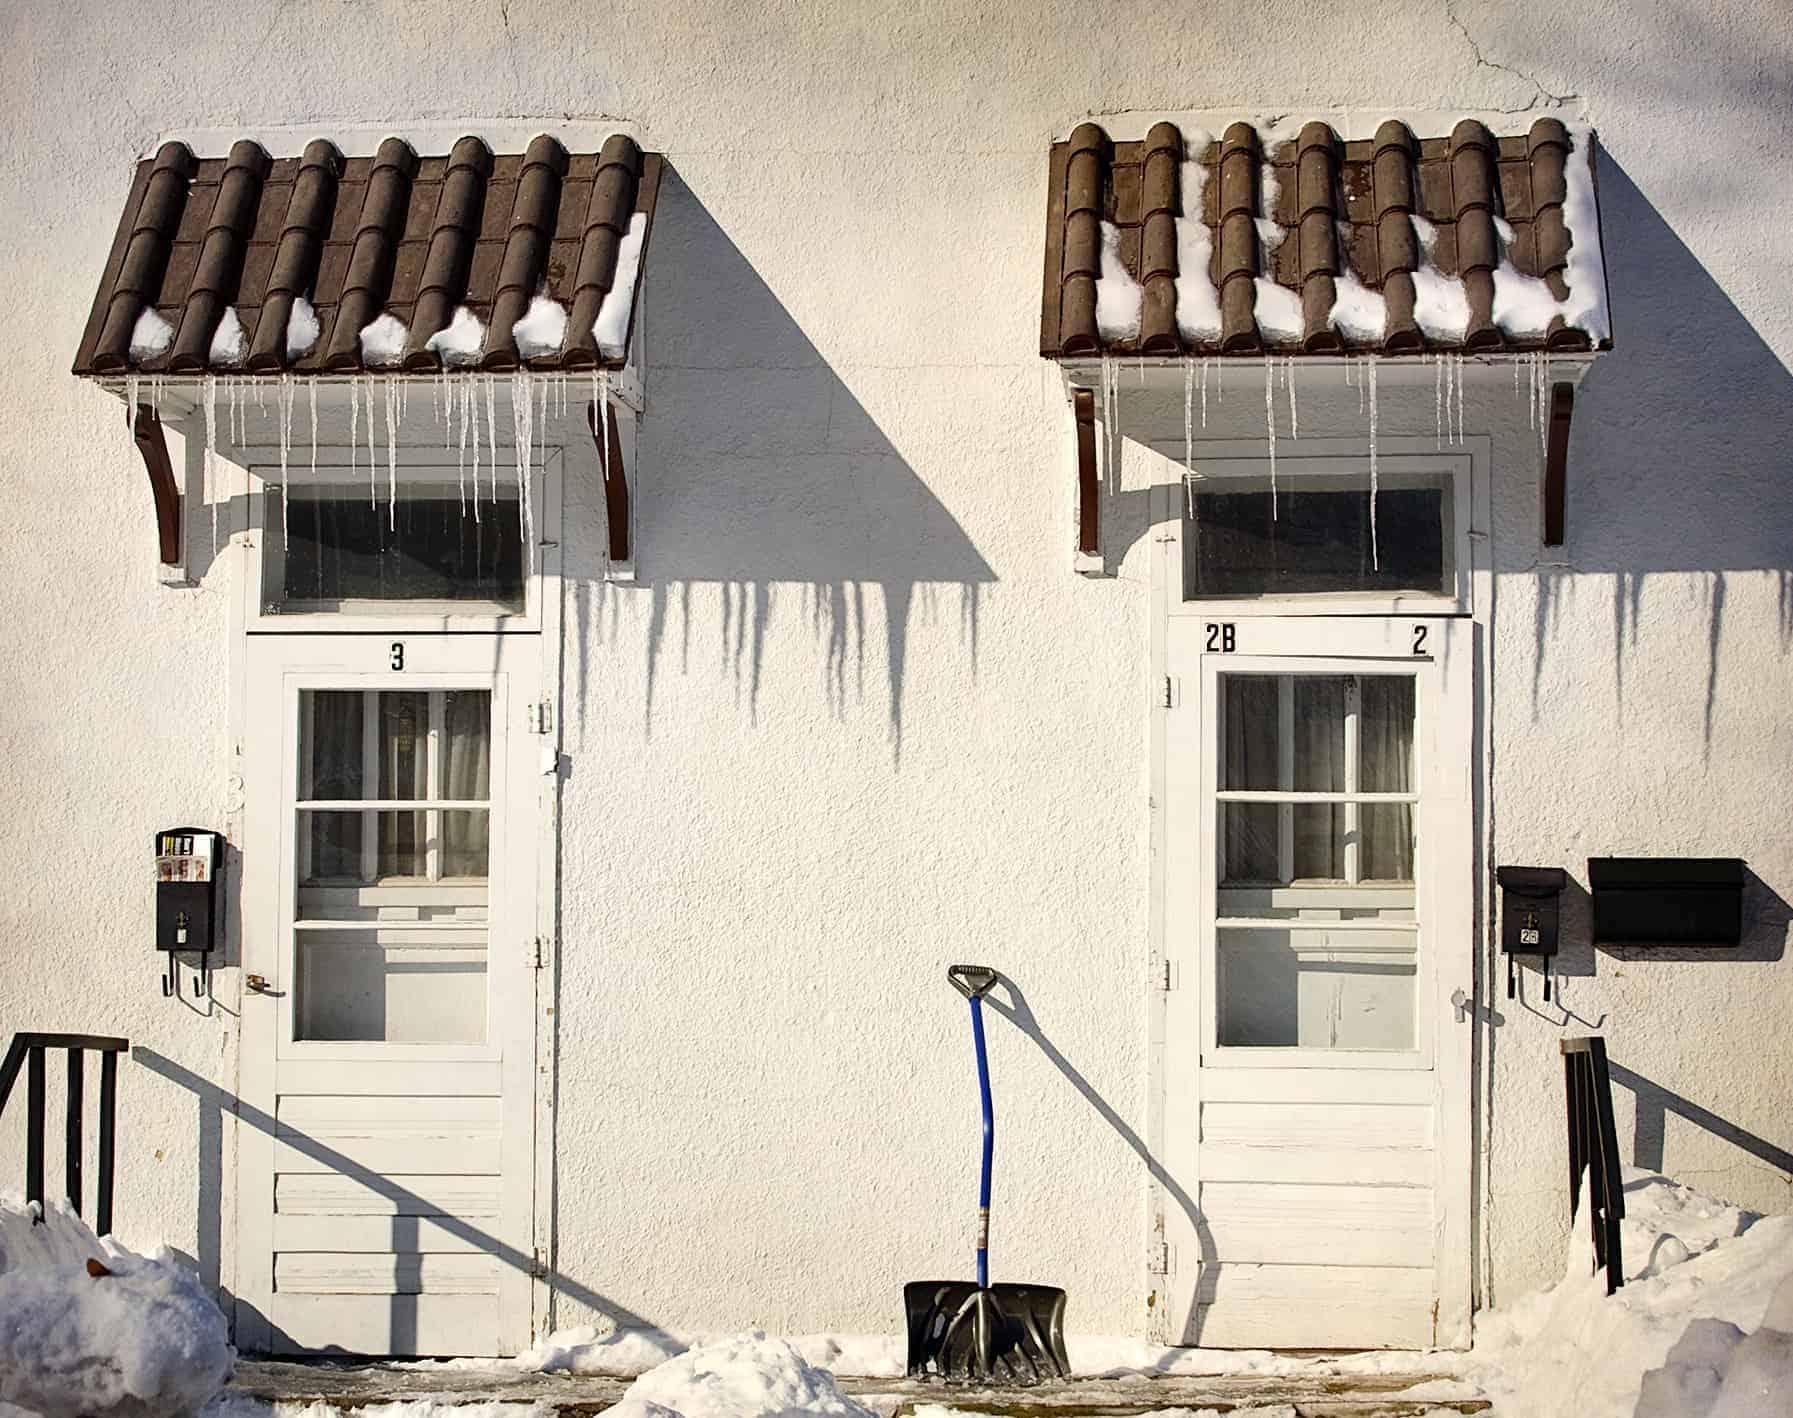 7 Reasons to Make Nice with Your Neighbors